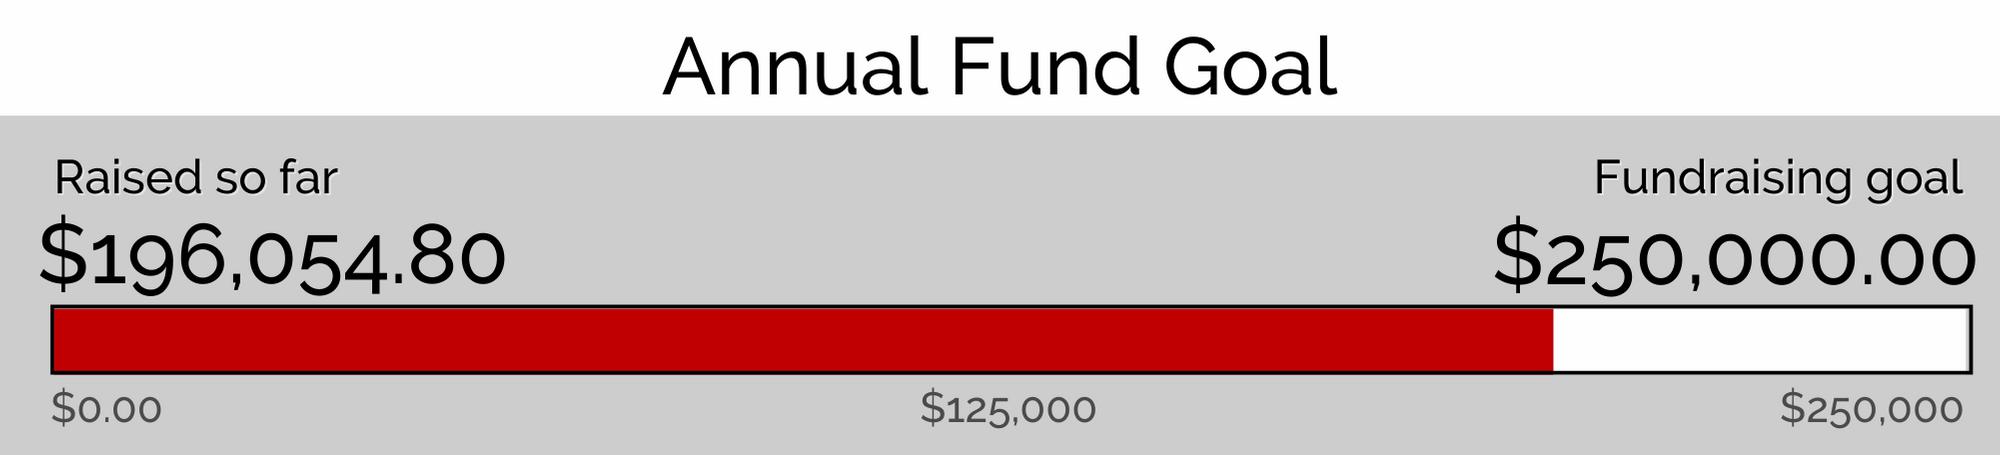 Annual Fund Goal